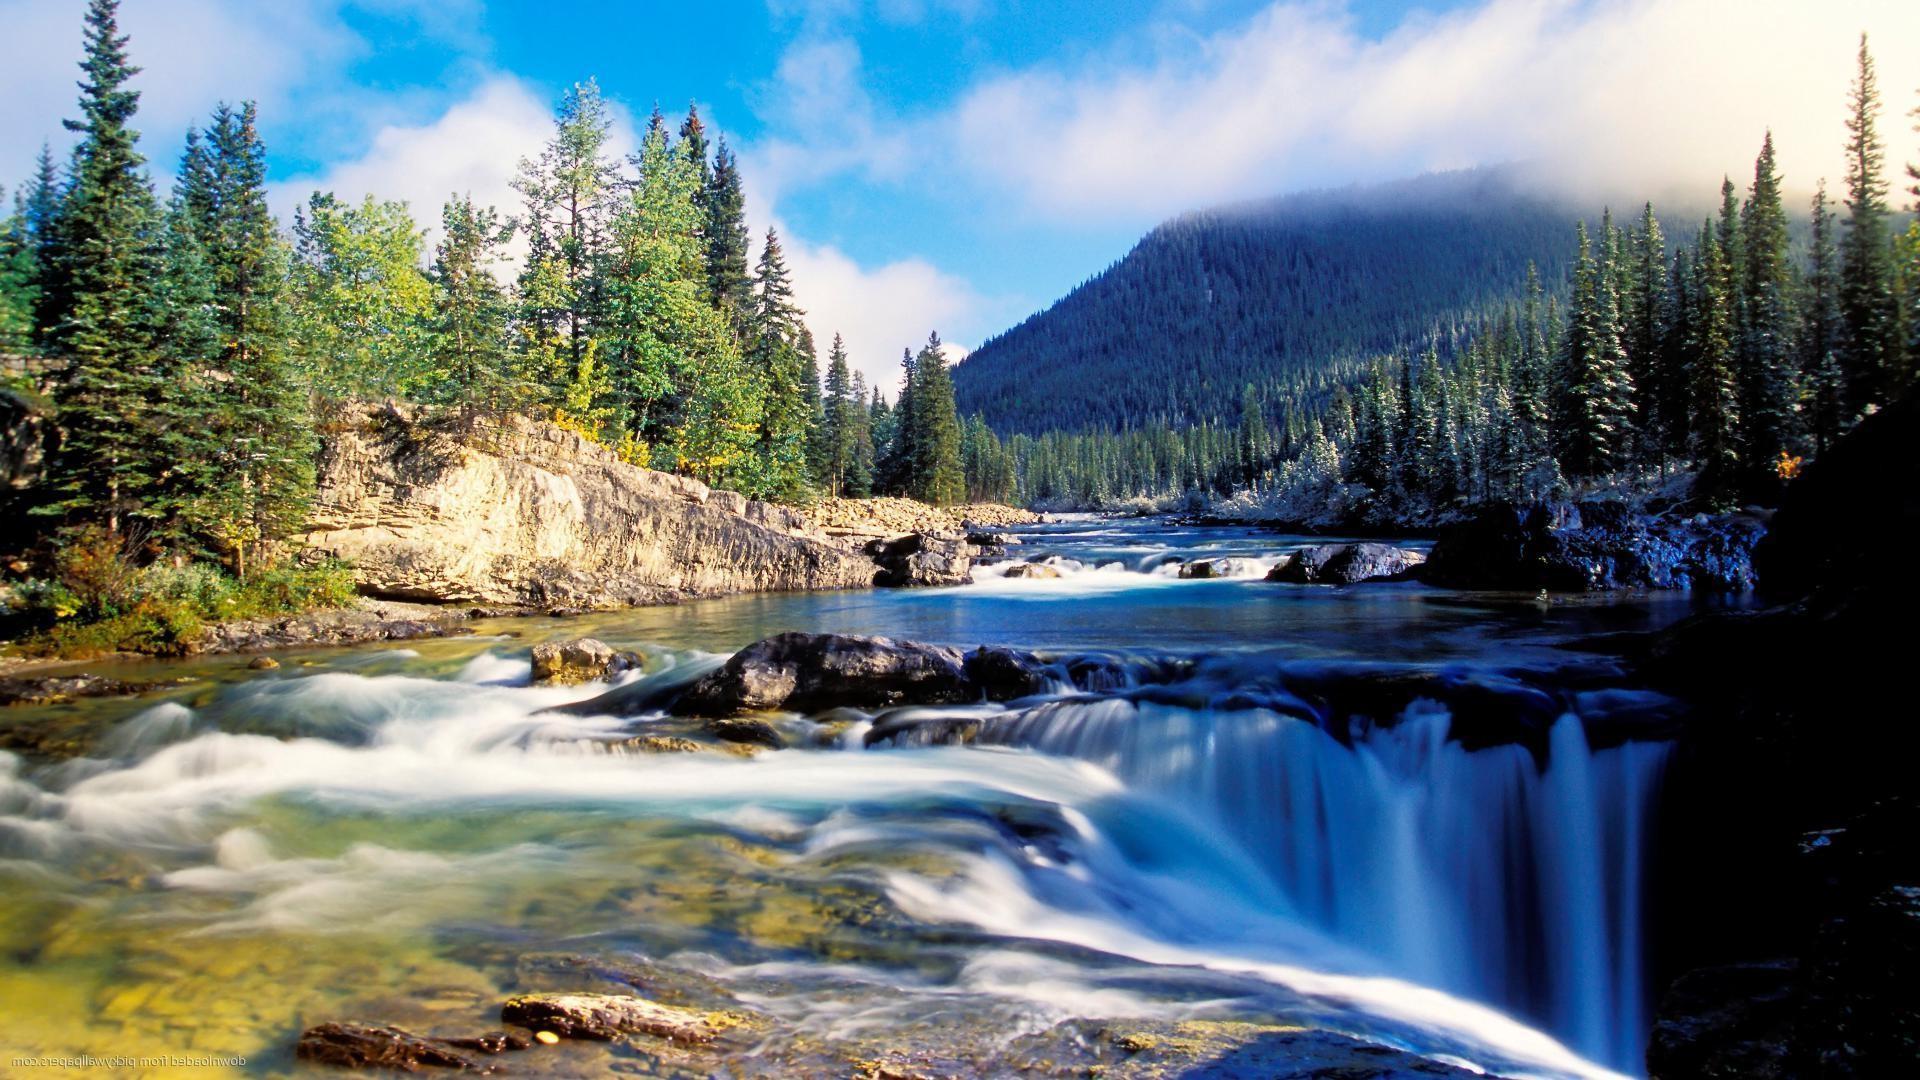 Cool And Beautiful Nature Desktop Wallpaper Image: 30+ Cool Summer Wallpapers